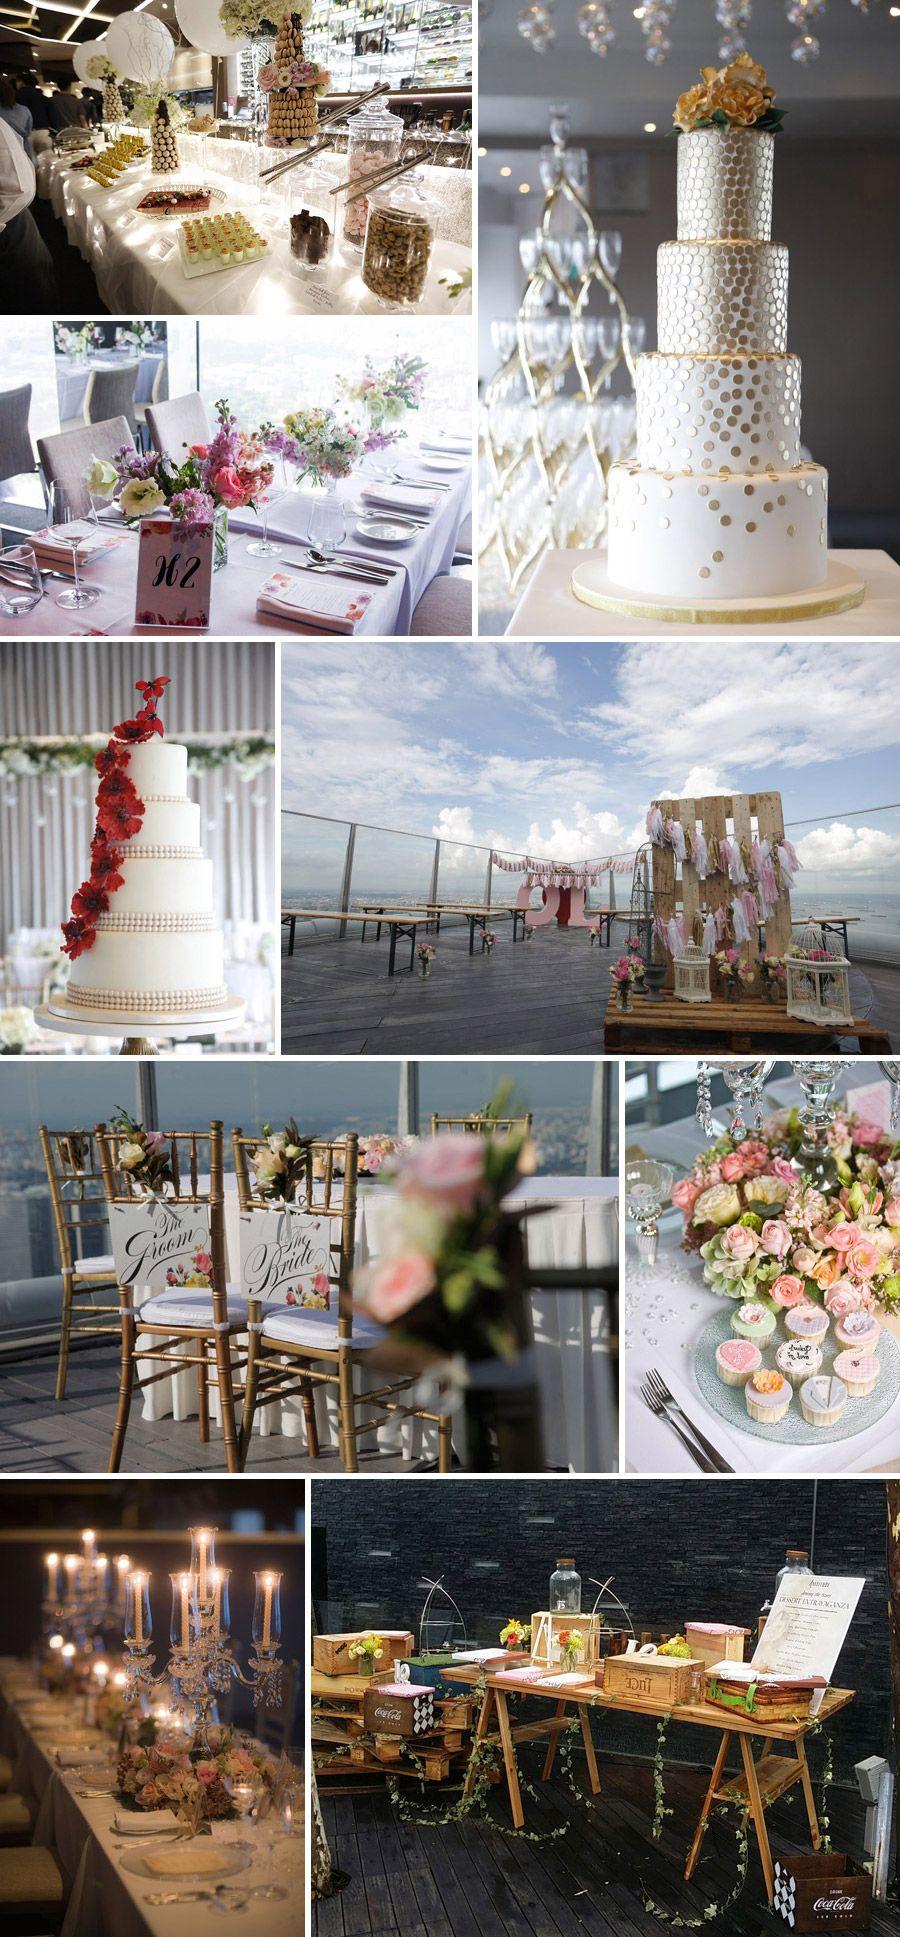 Beautiful decor cake and wedding favours